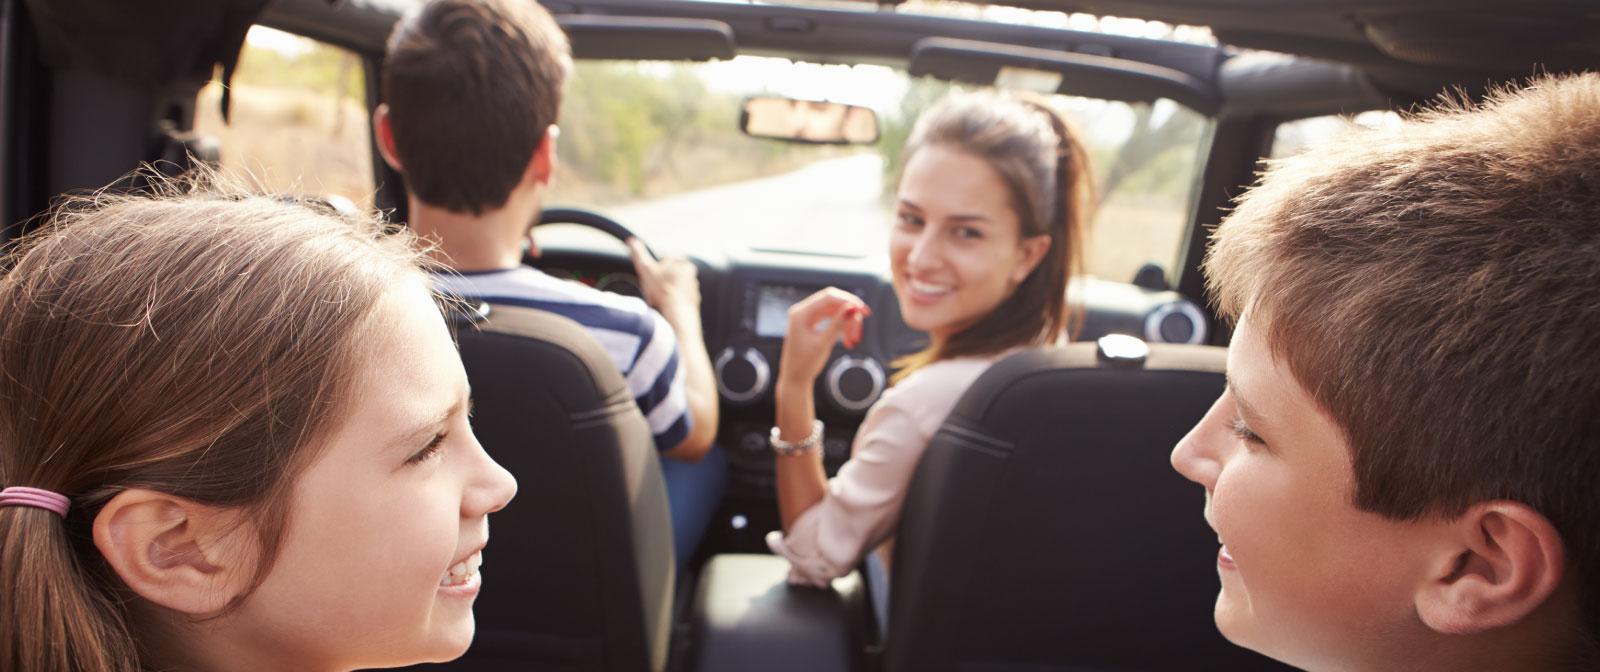 Familia en coche detrás